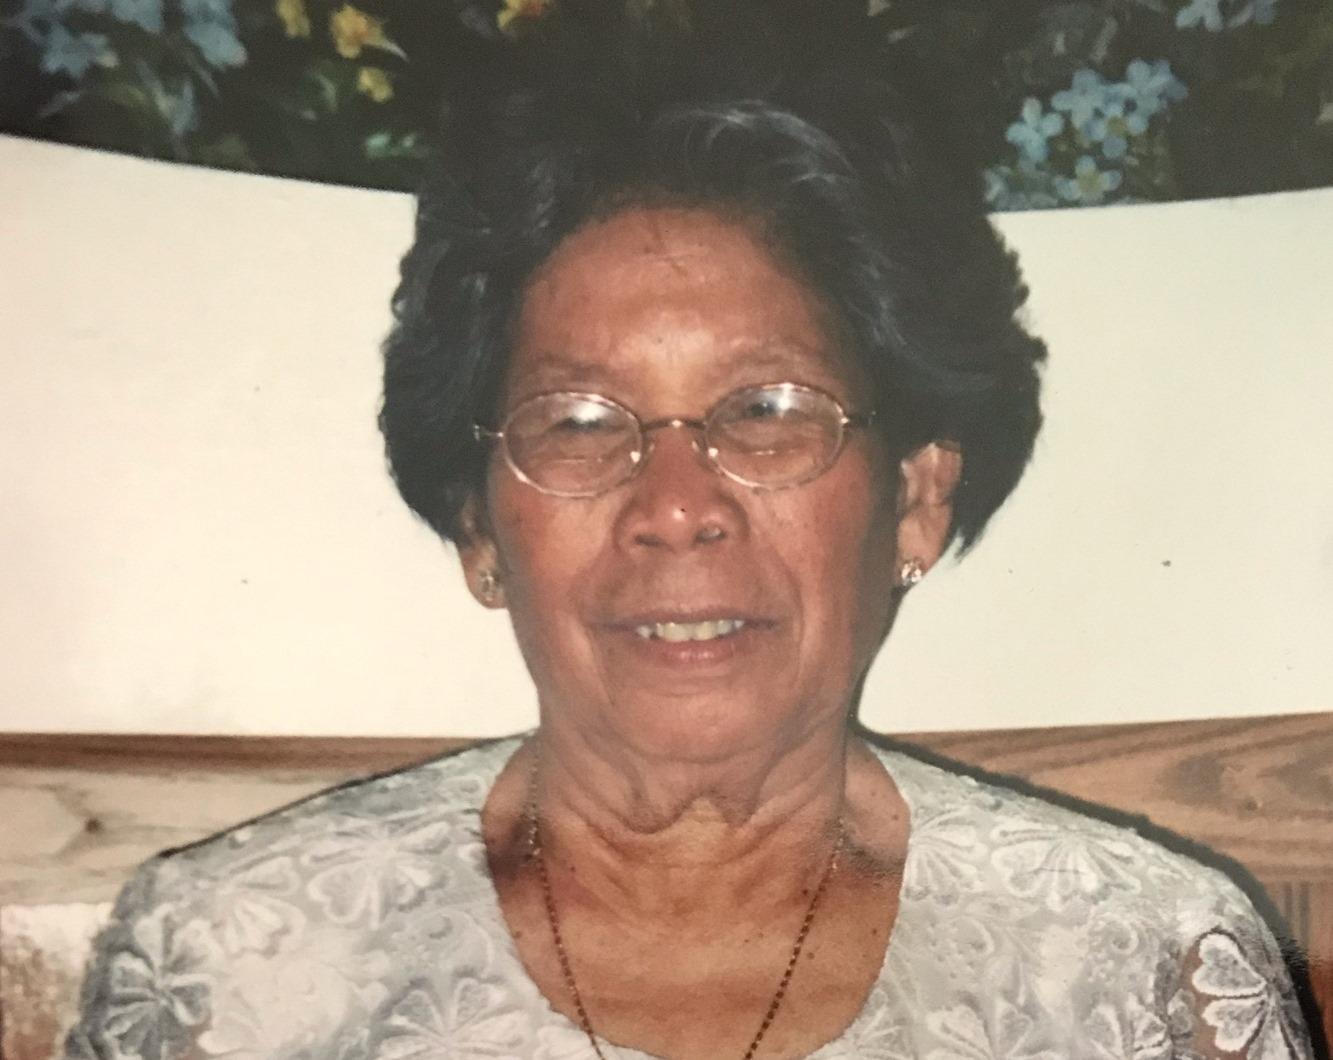 Mak Neou of Lowell